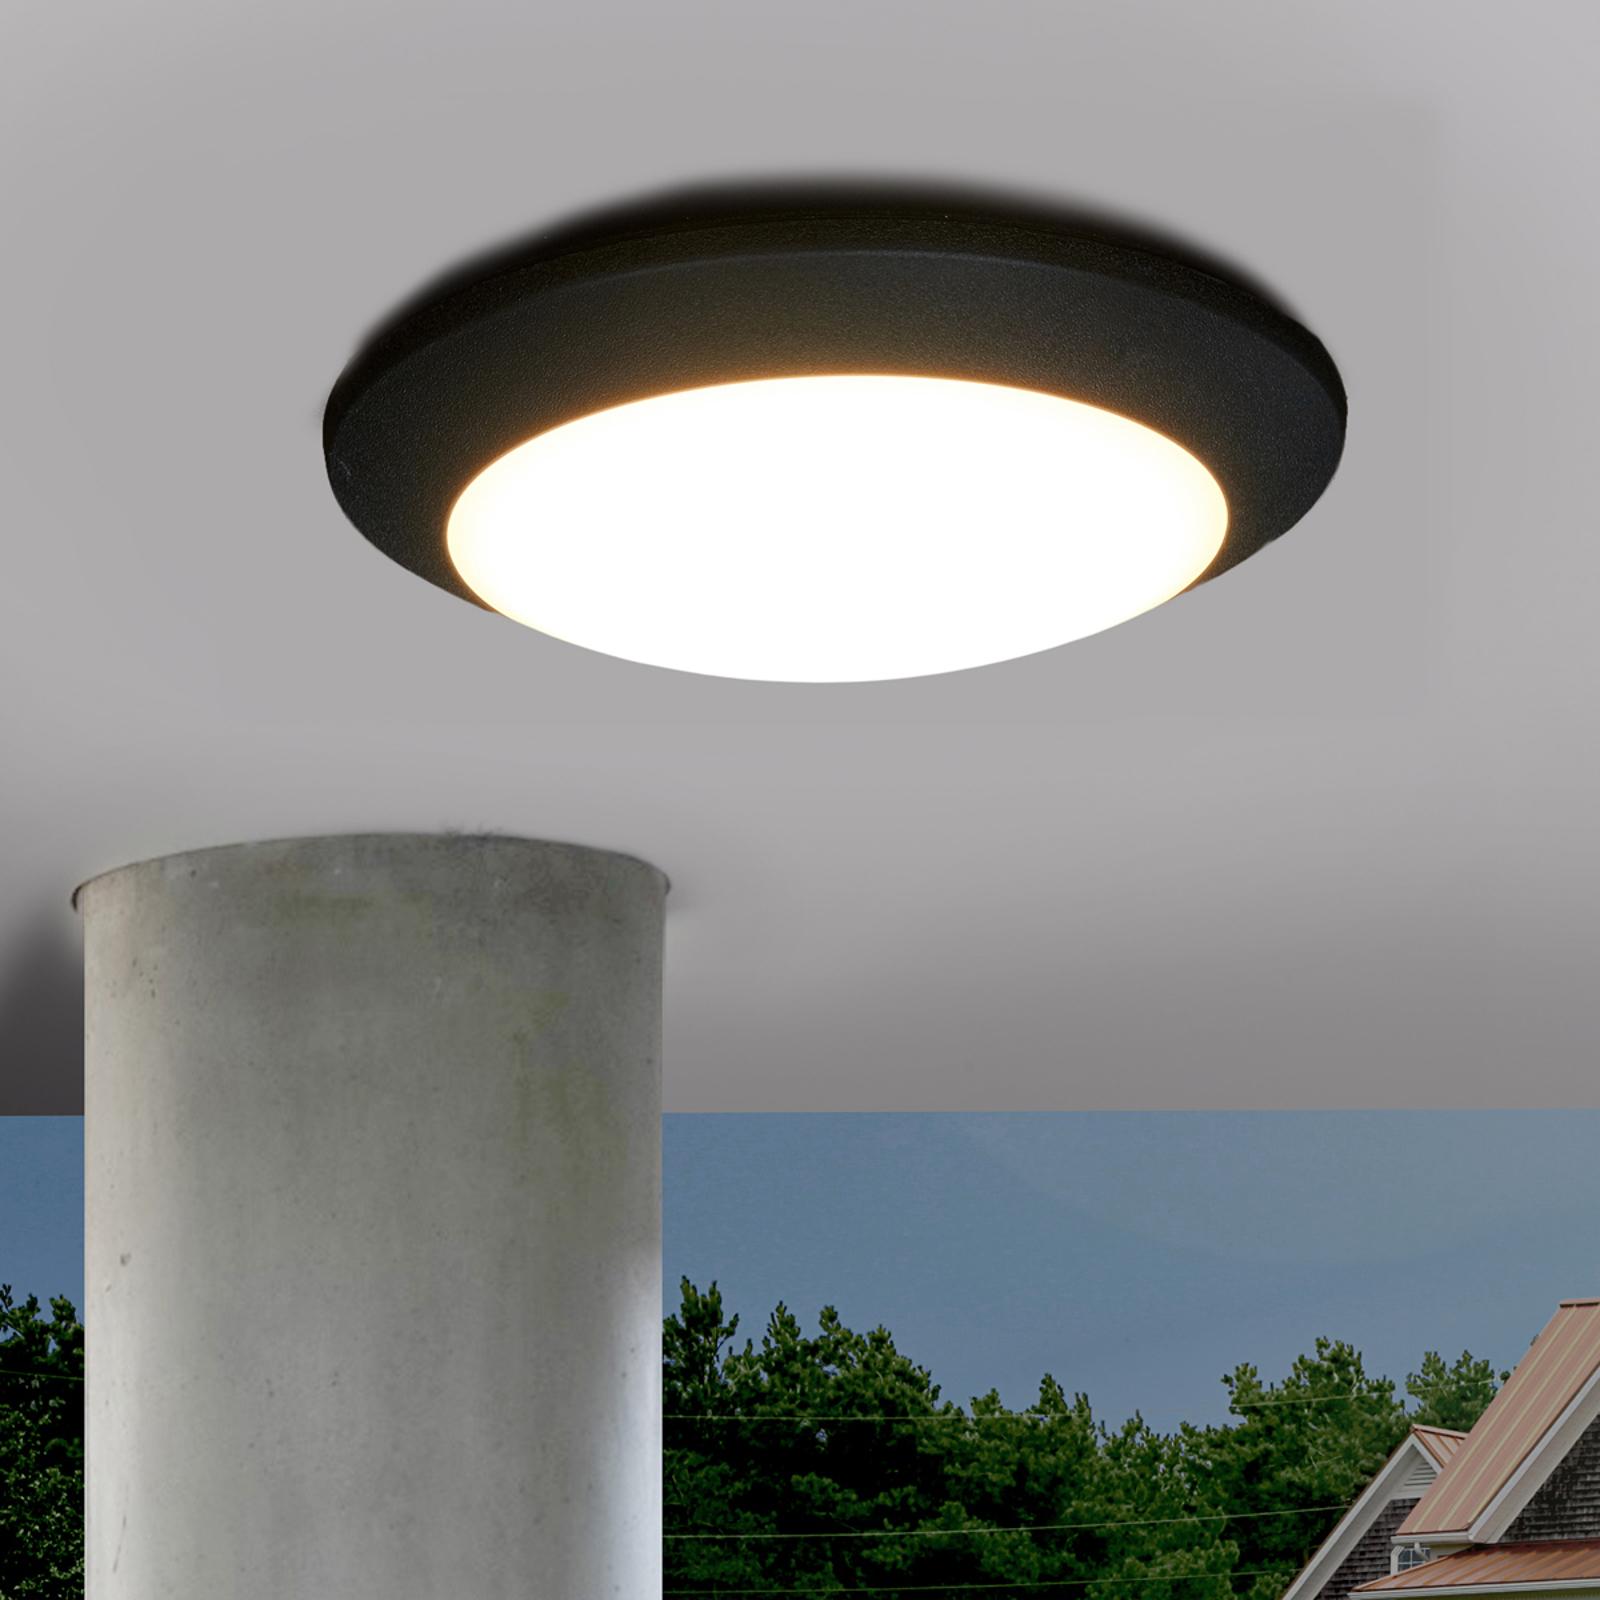 Zewnętrzna lampa sufitowa LED BERTA, czarna